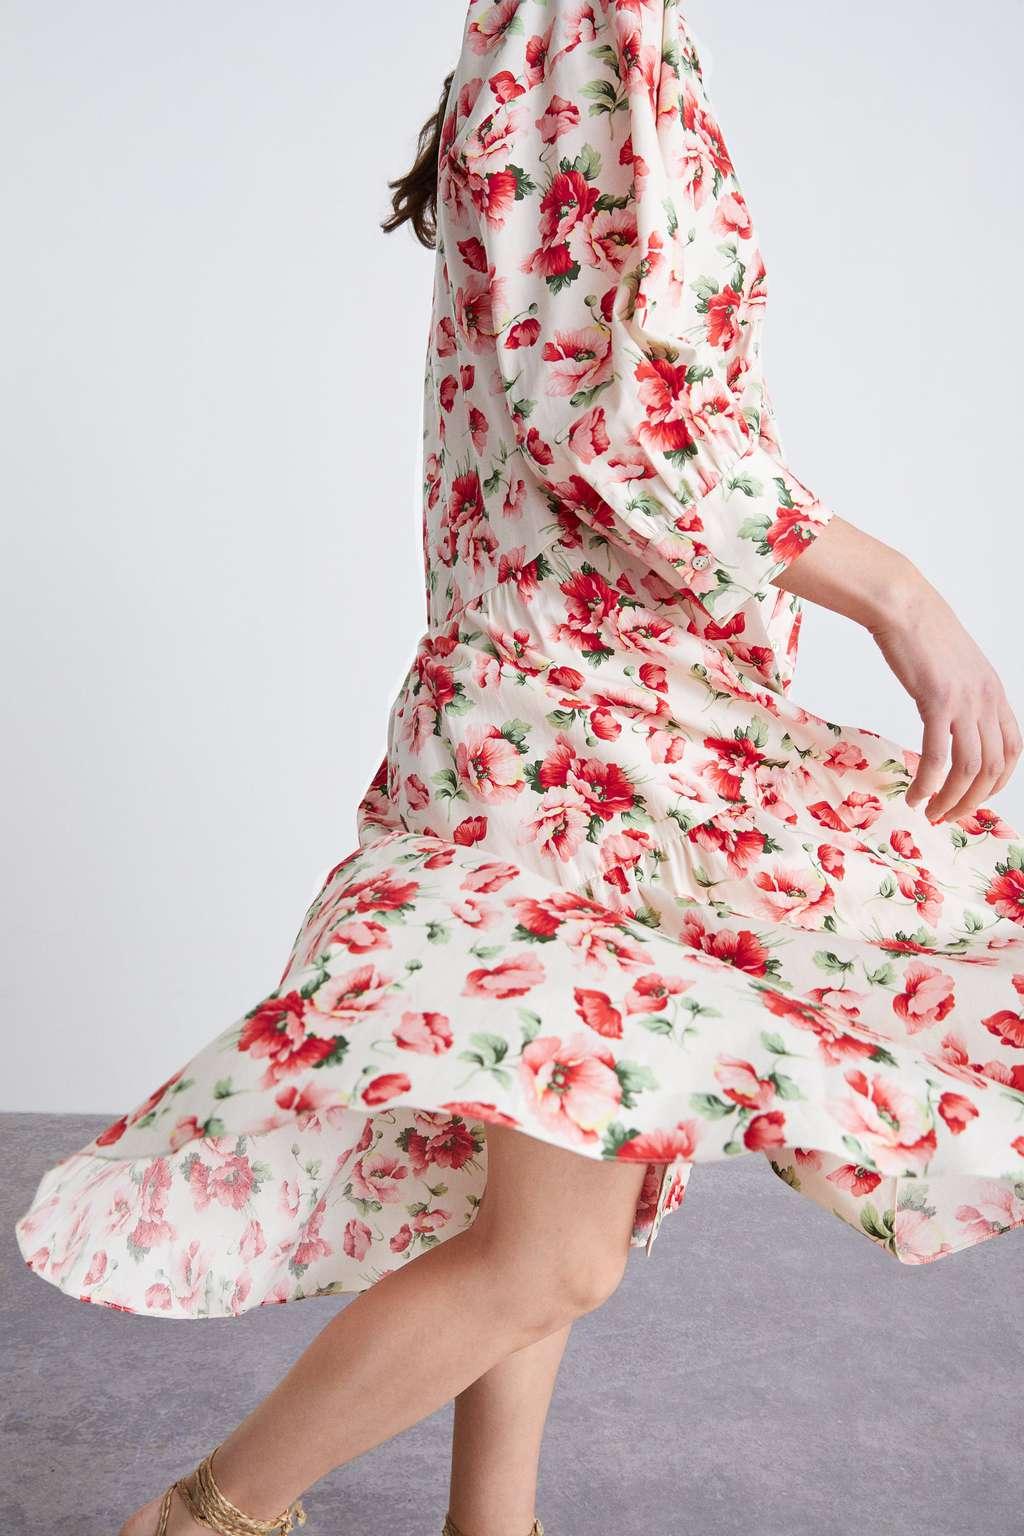 Pretty floral print dress from Zara